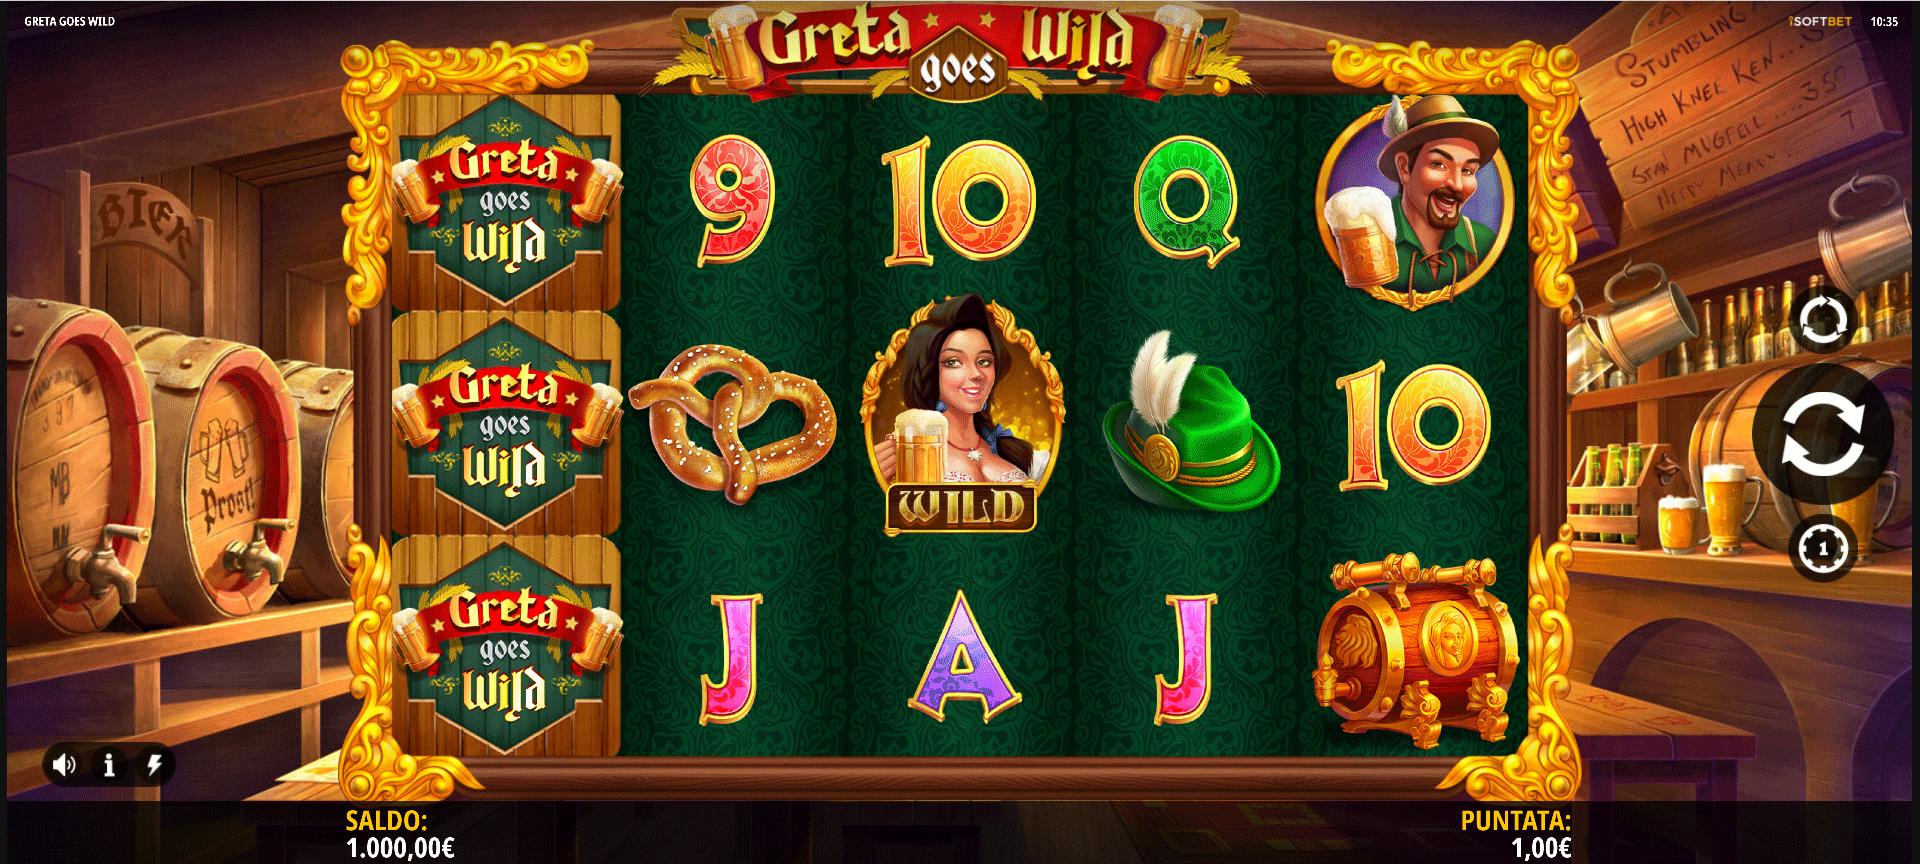 Slot Greta Goes Wild